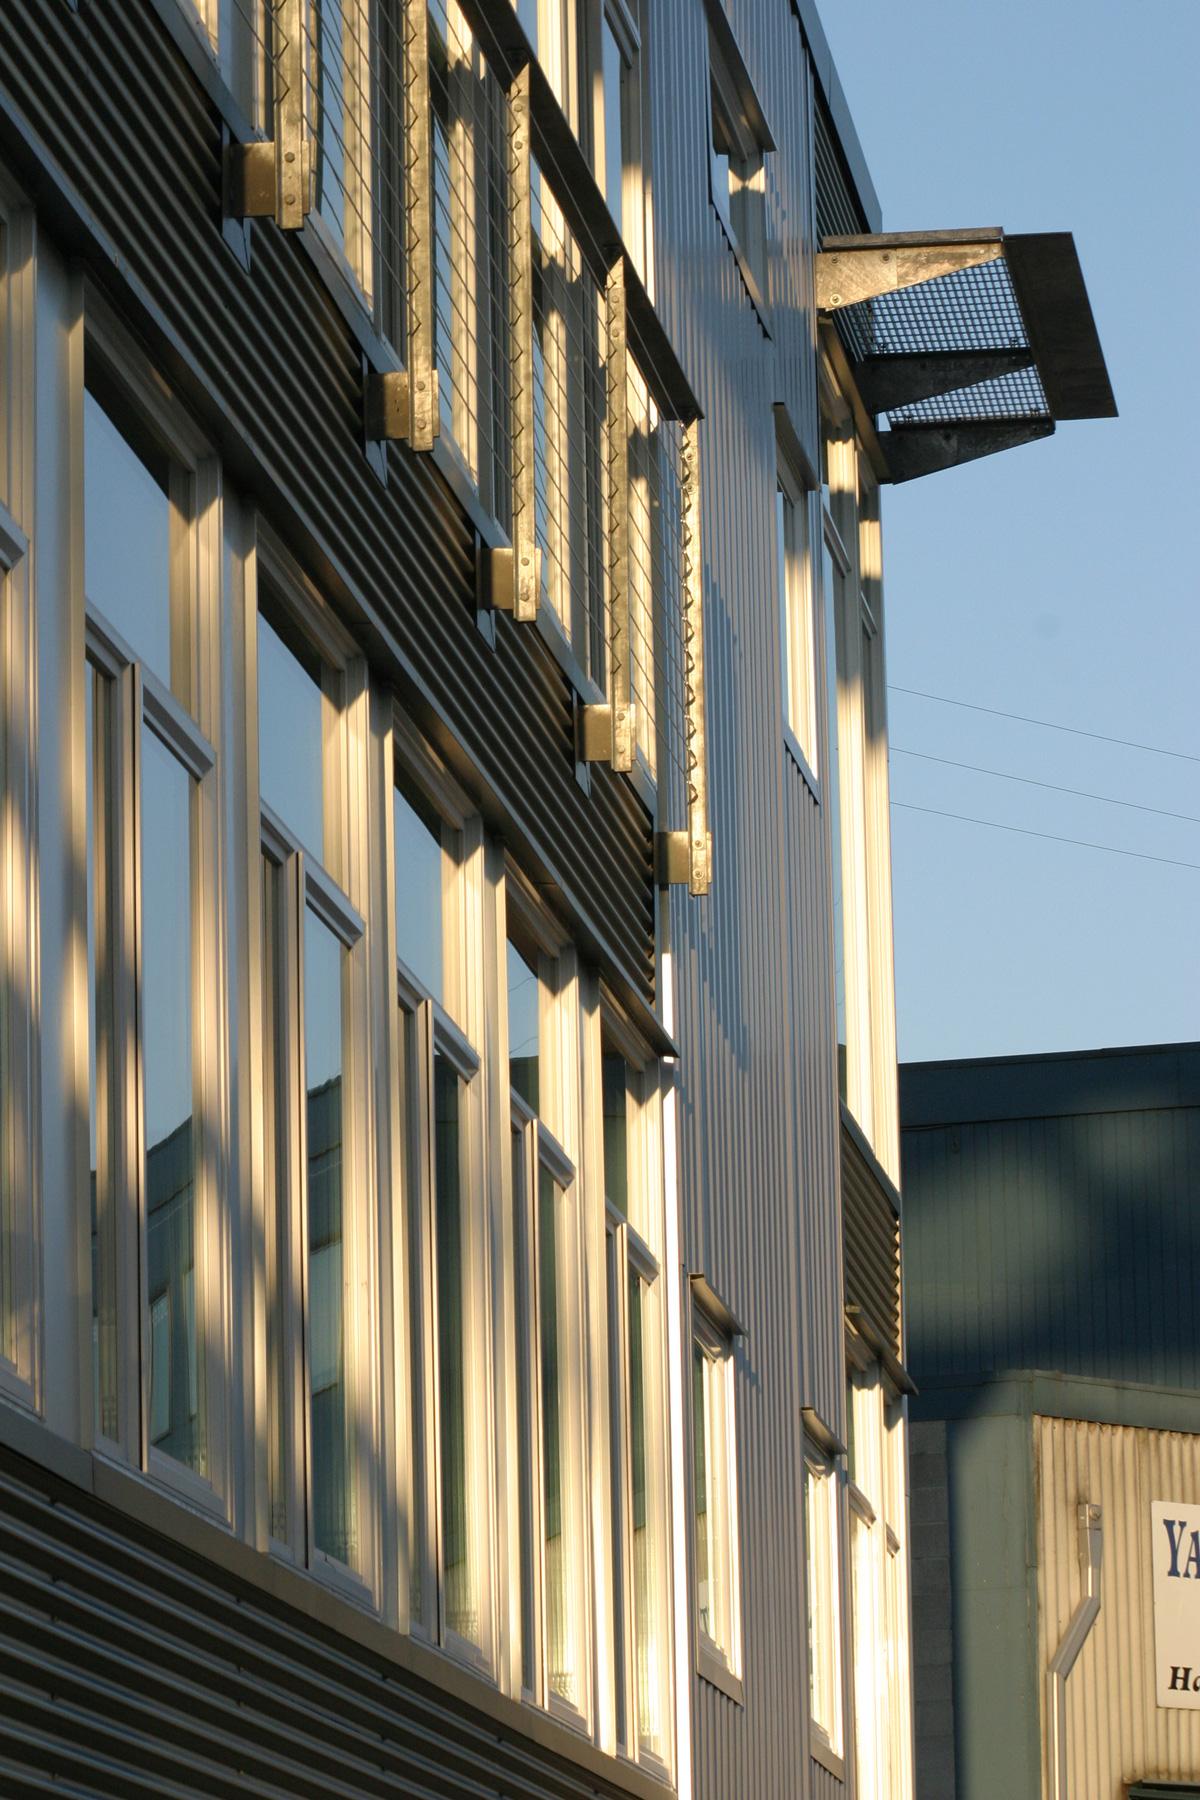 Boat Street Landing building exterior windows